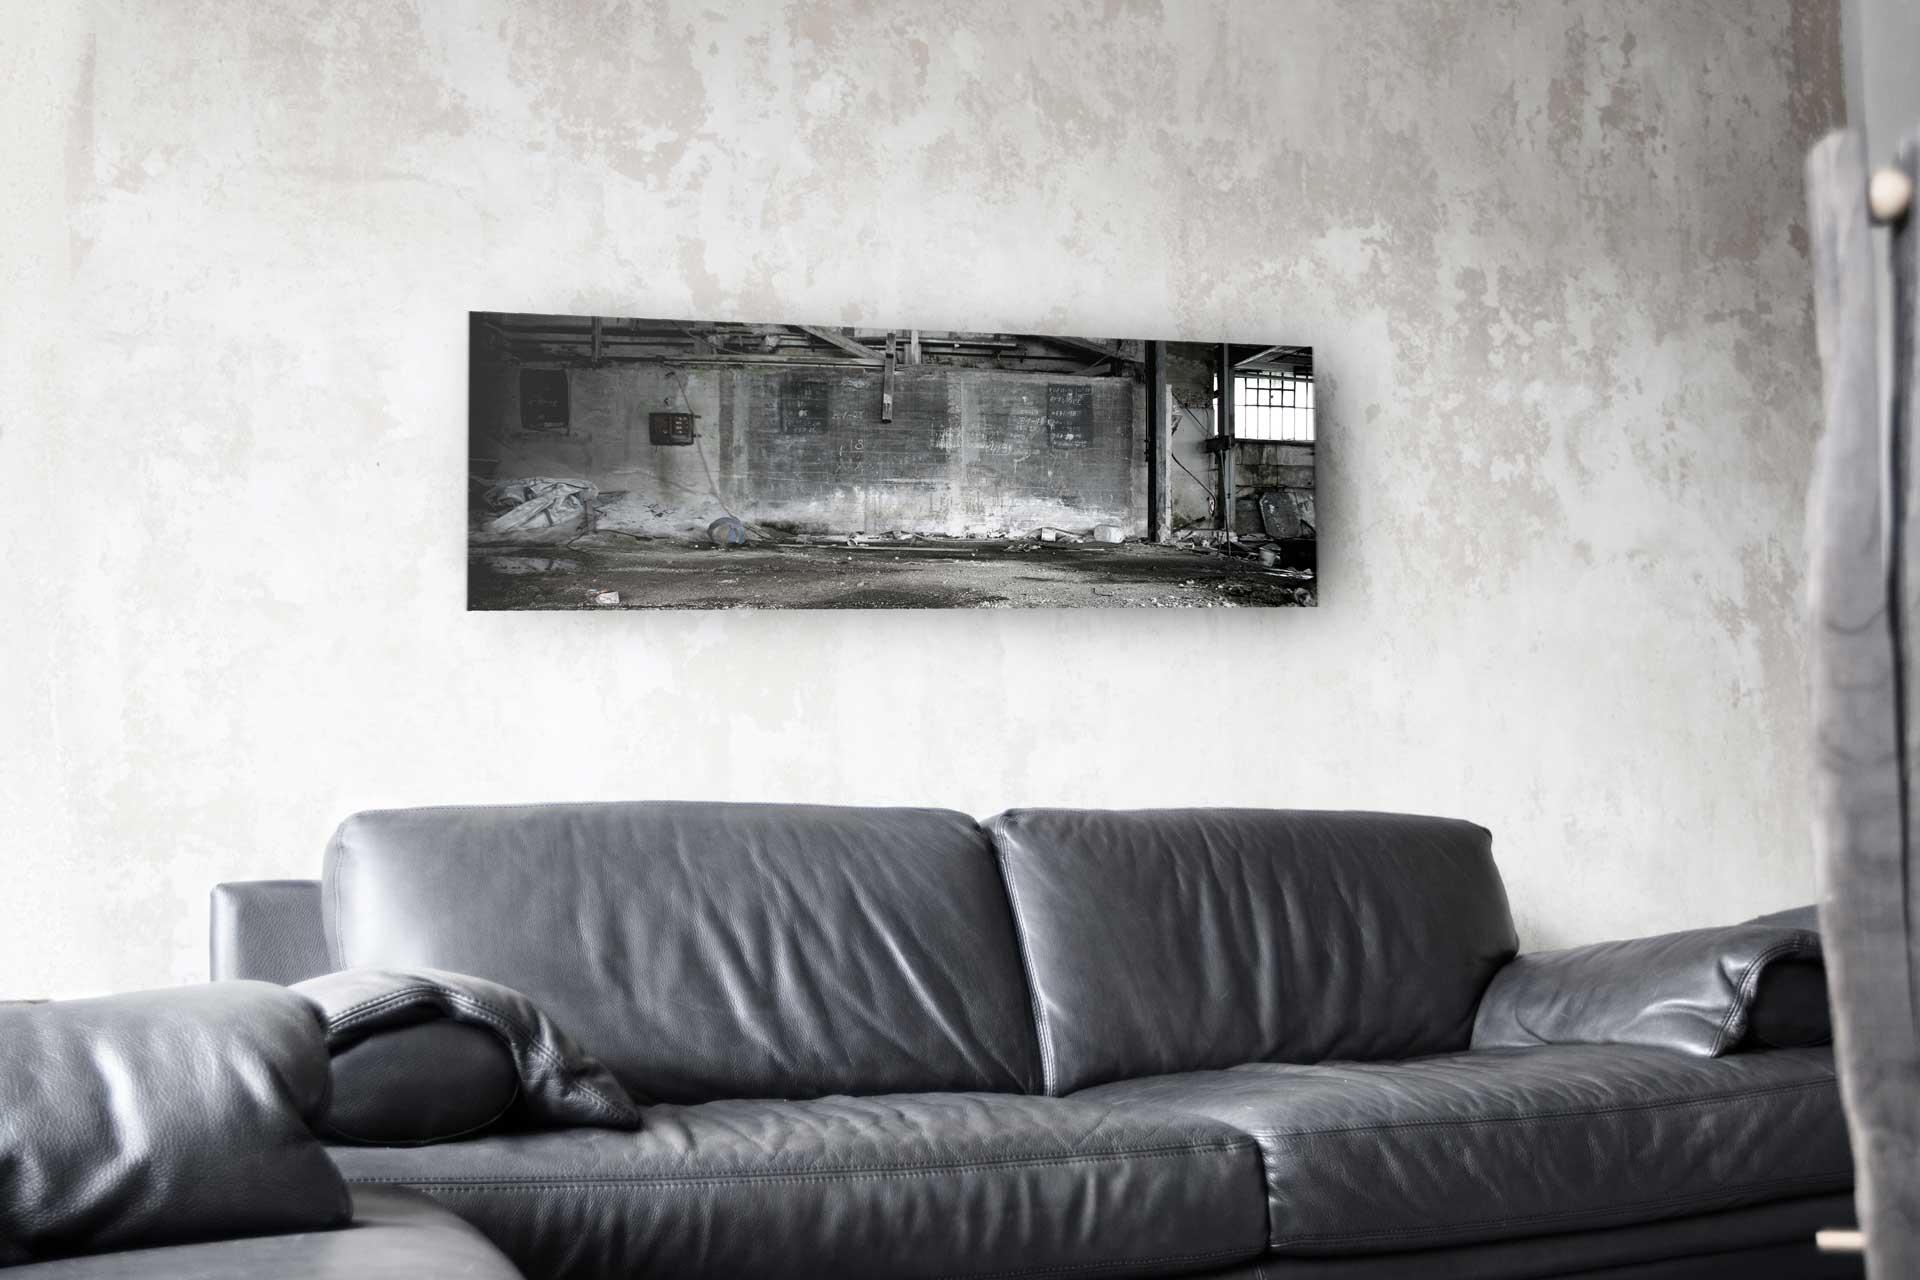 areal unsichtbarer lautsprecher bedruckt wohnzimmer-sofa hommbru